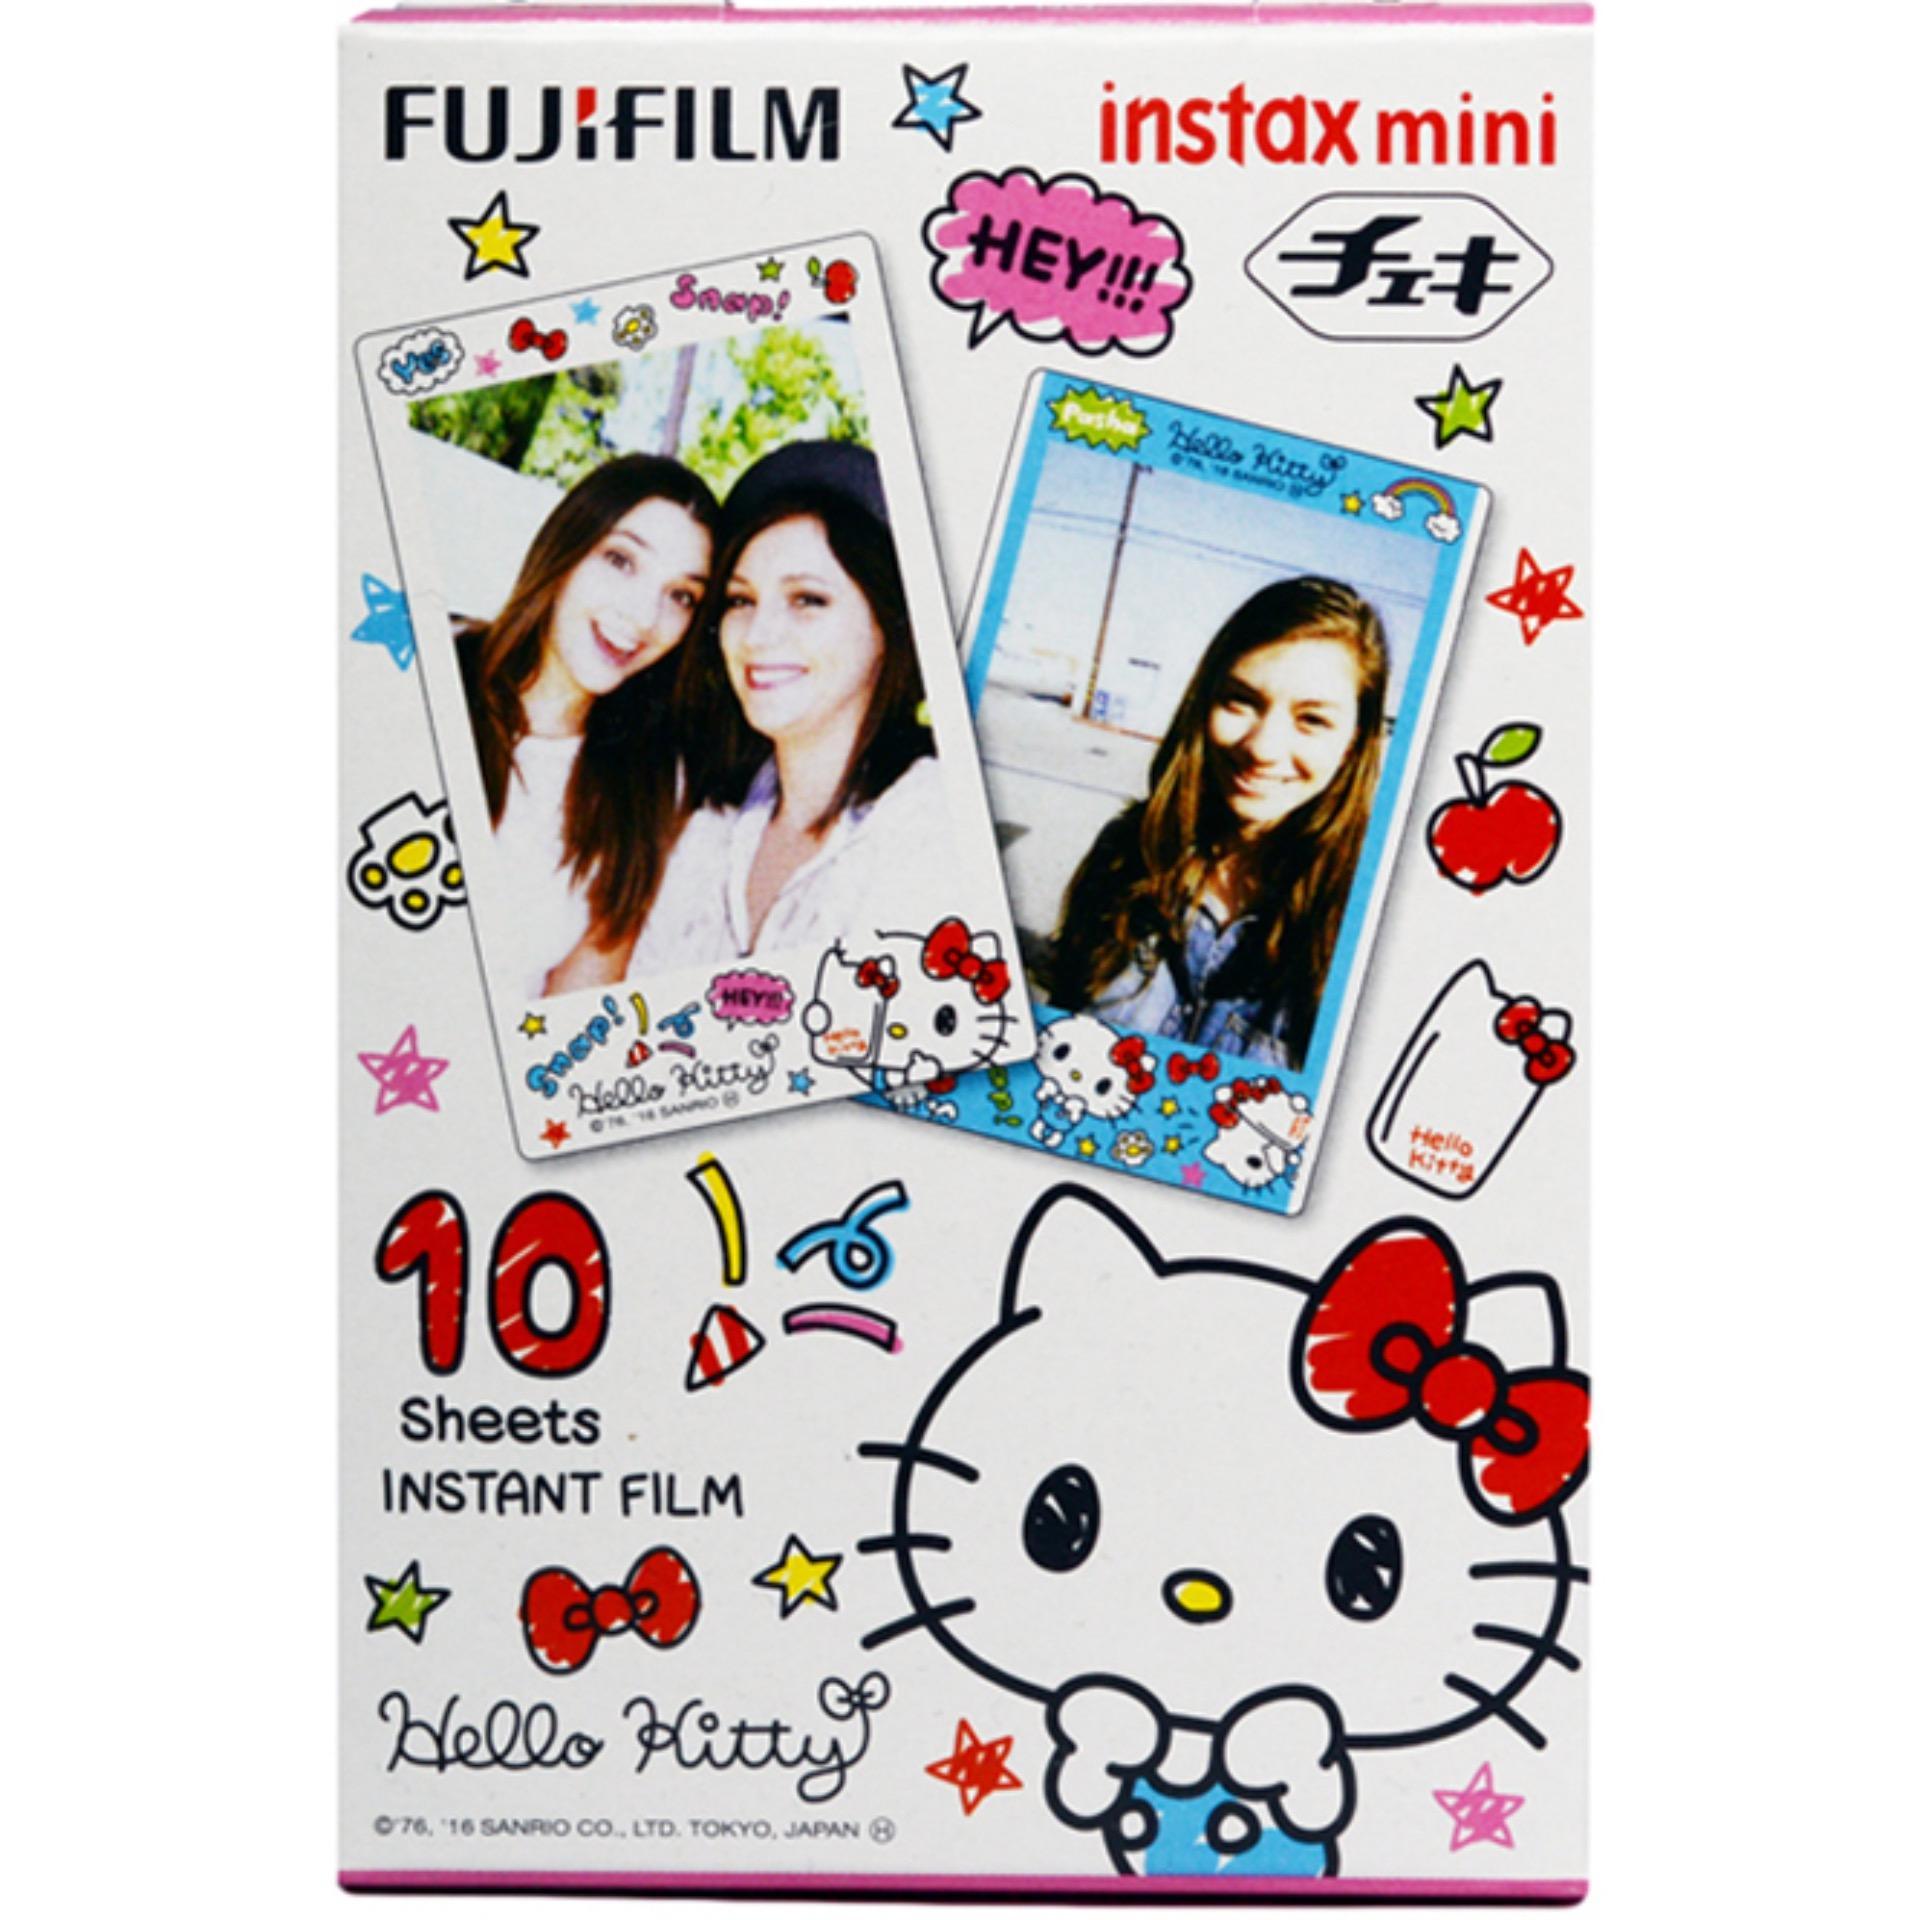 Fujifilm Instax Mini Hello Kitty Doddle Instant Films – 10 Sheets